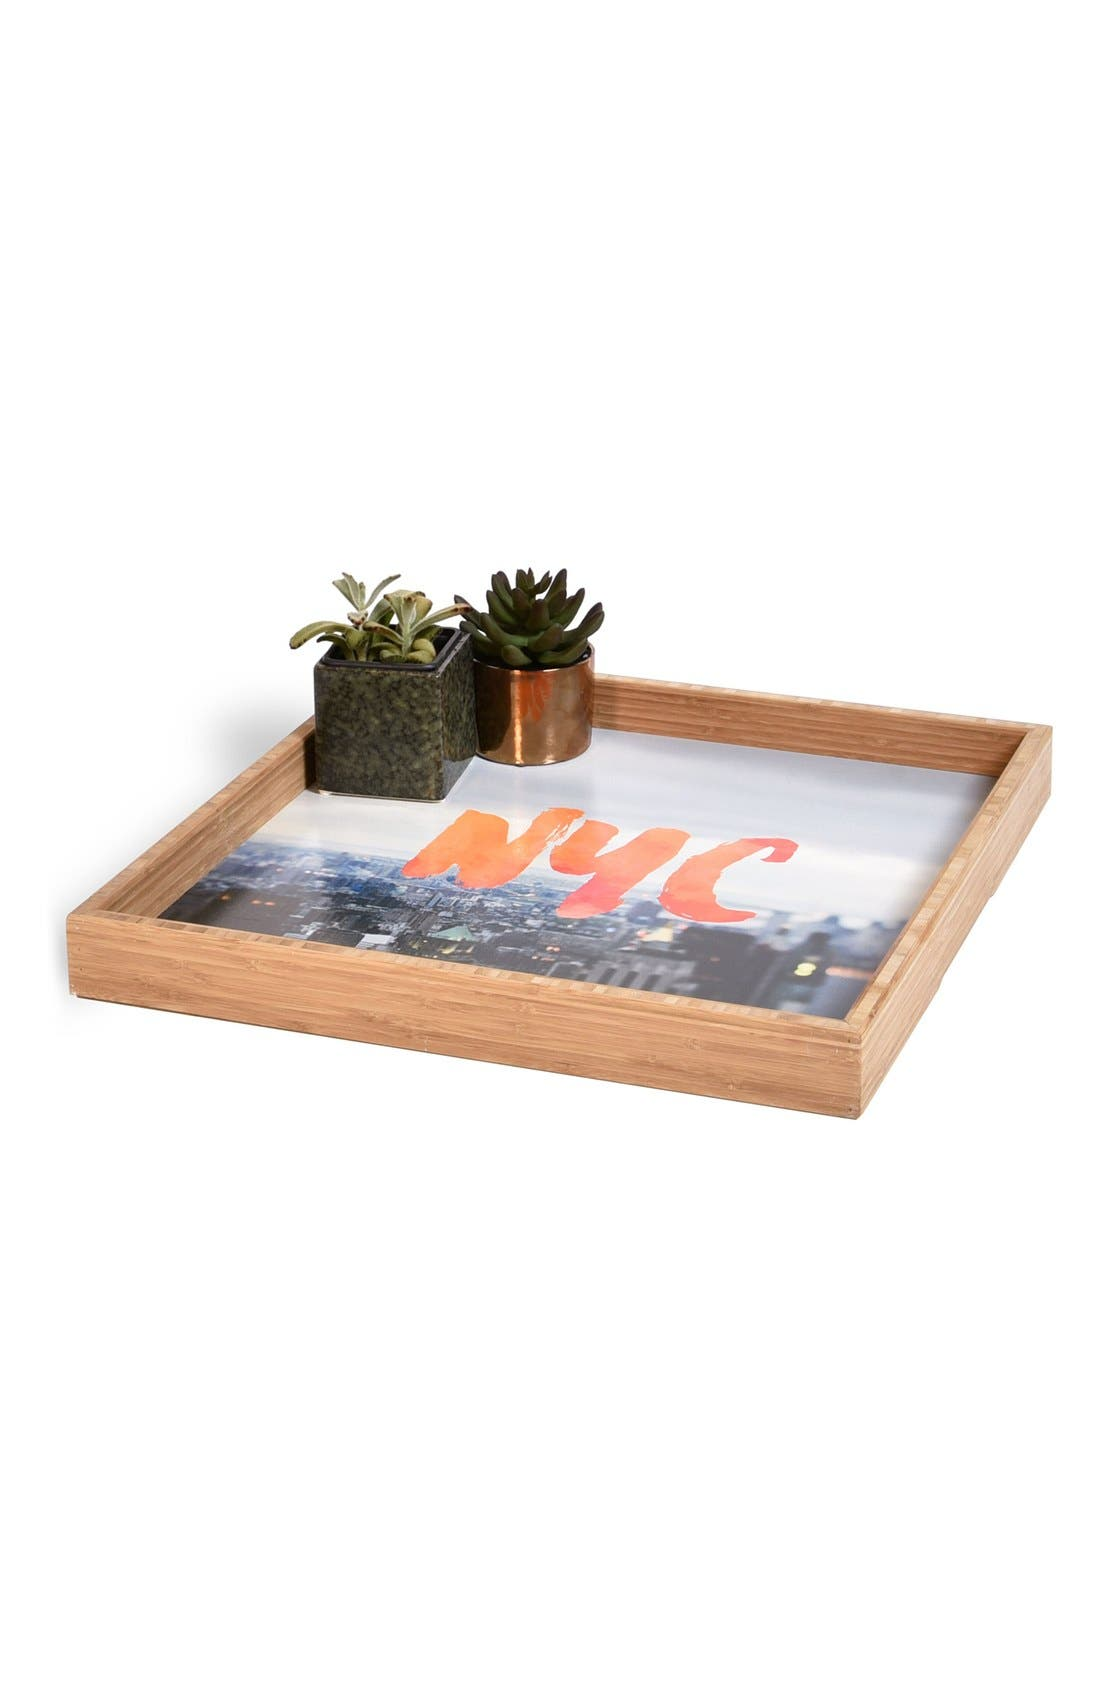 'NYC Skyline' Decorative Serving Tray,                             Alternate thumbnail 2, color,                             Orange